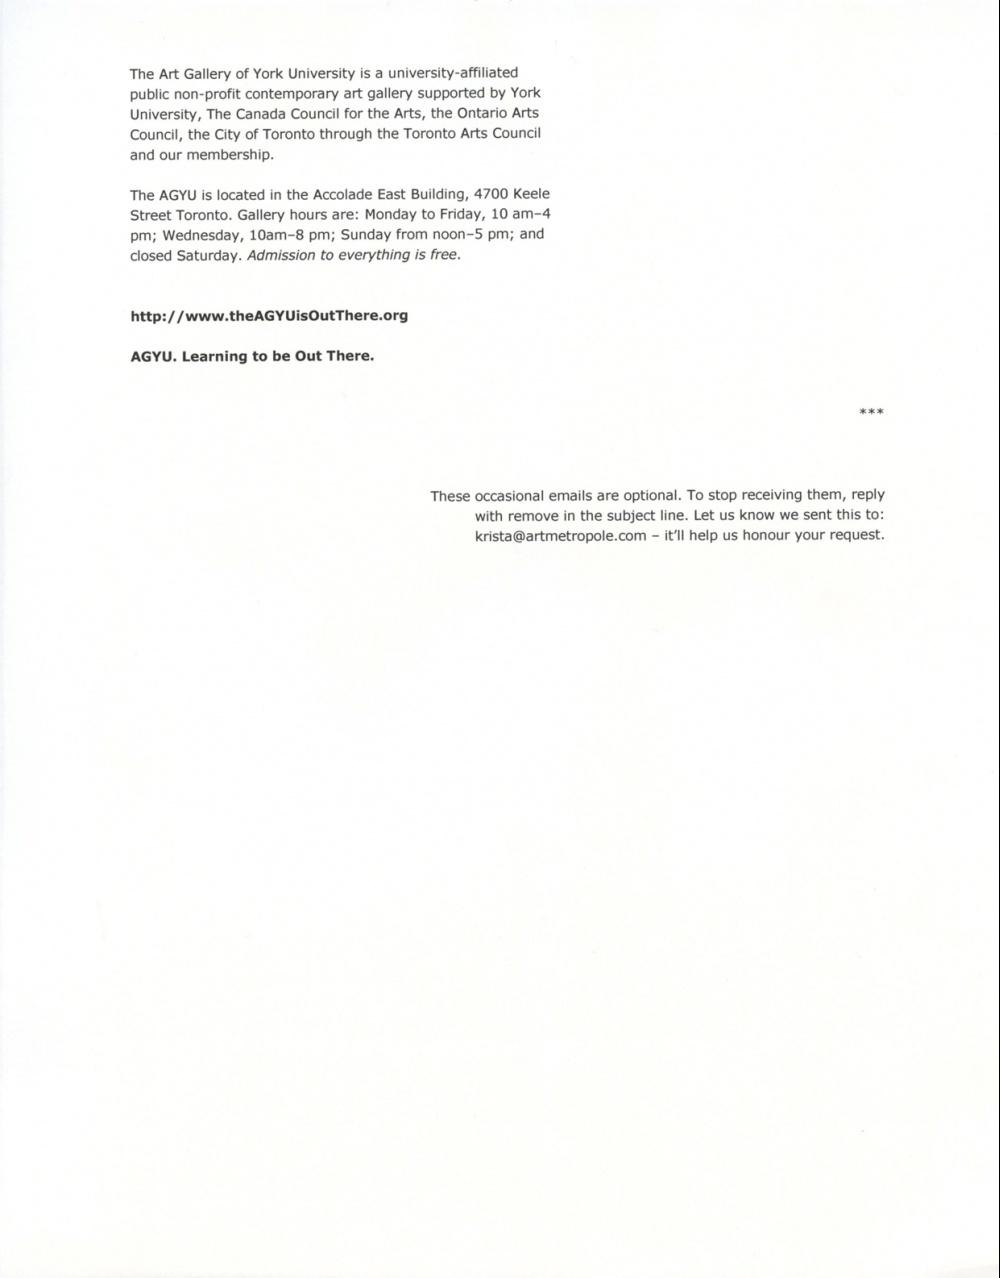 AMA1214, page 2